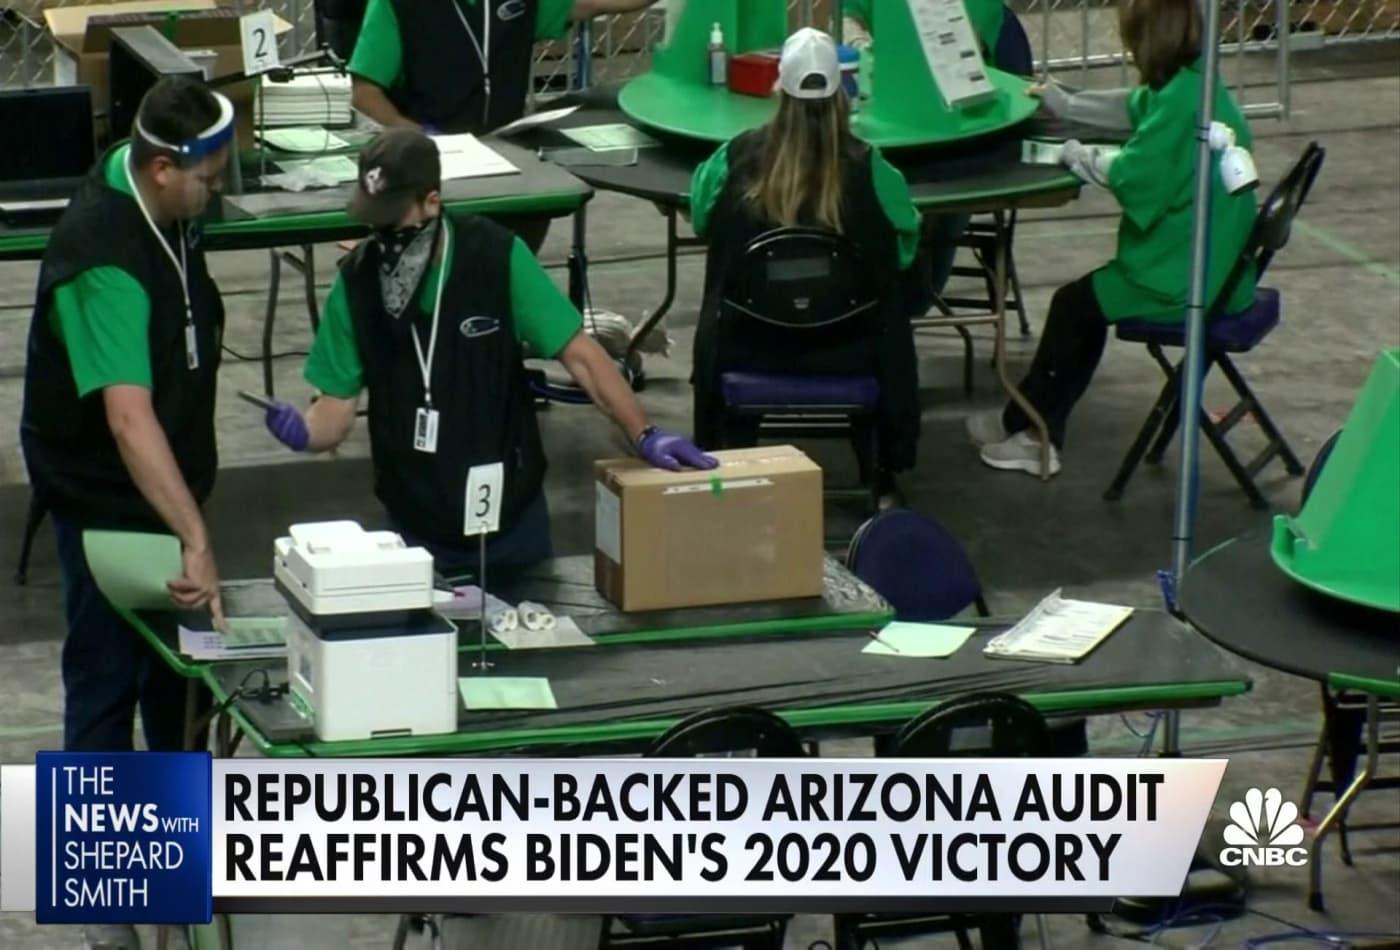 Republican-backed Arizona audit confirms Biden win